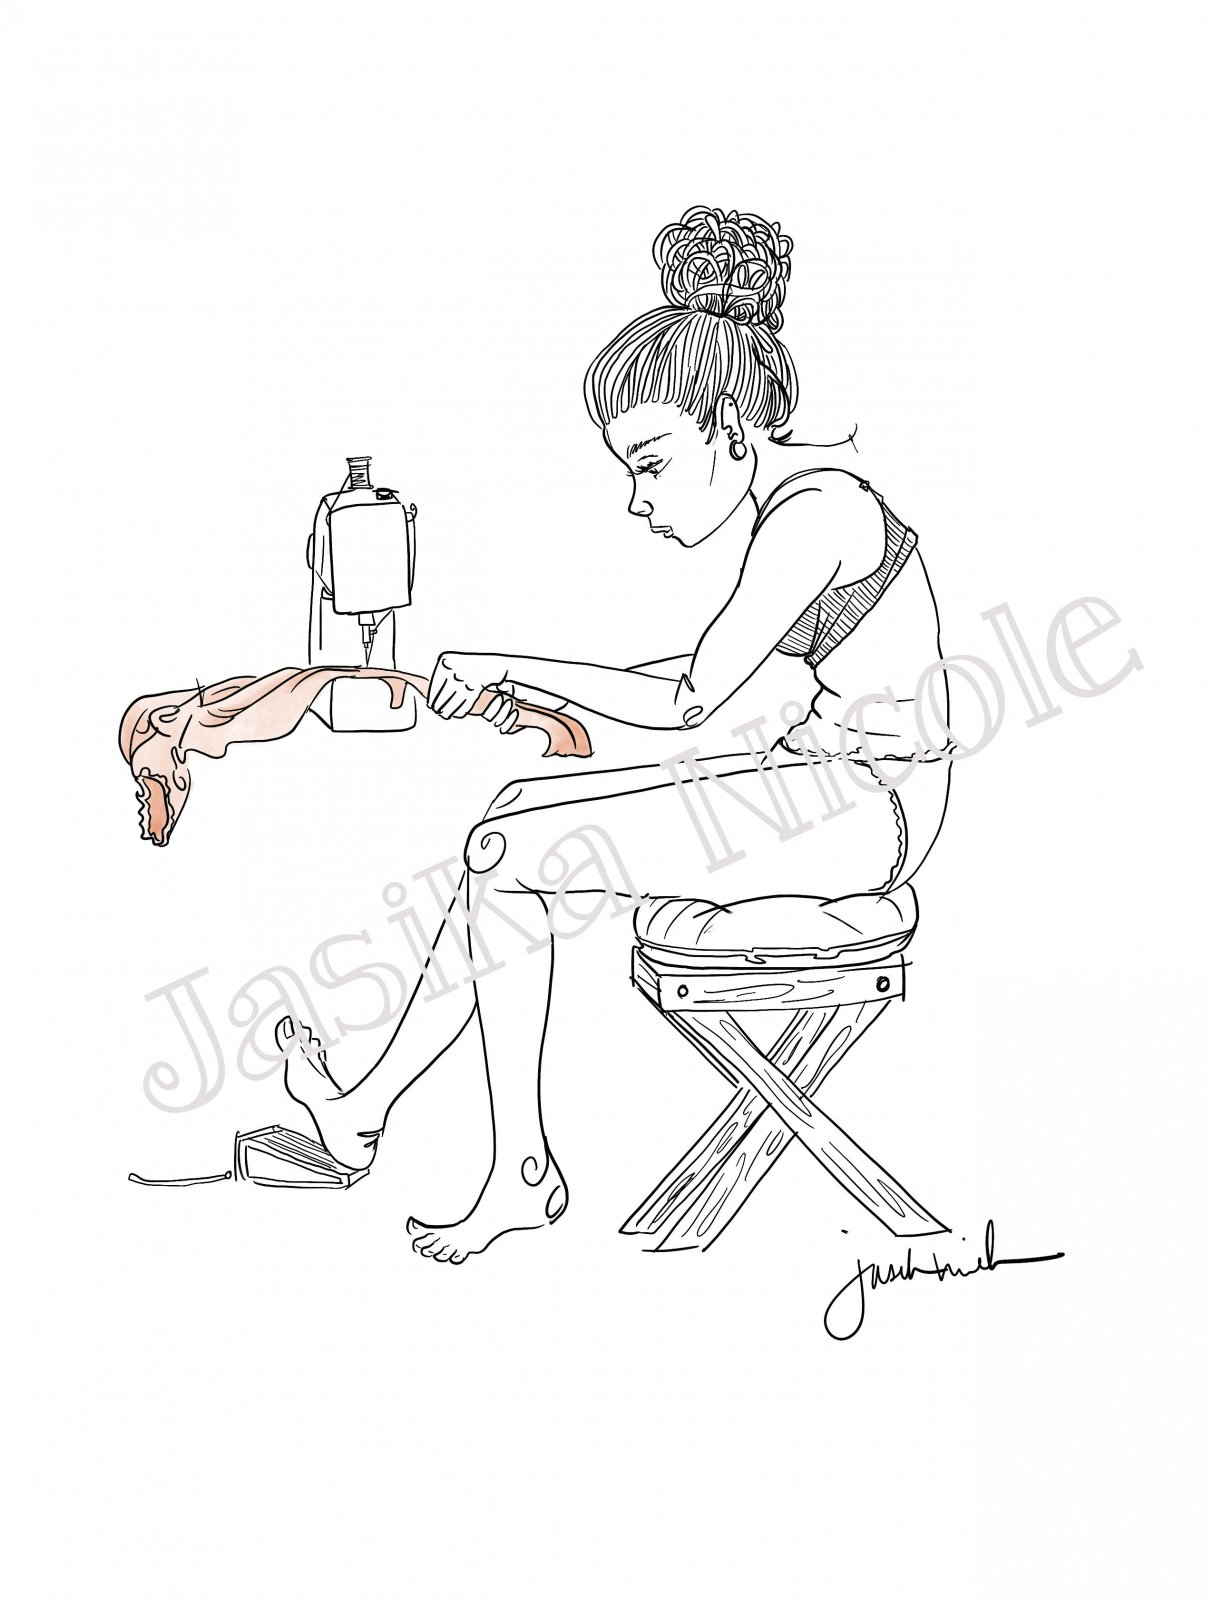 Machine Dream Illustration by Jasika Nicole; 11x17